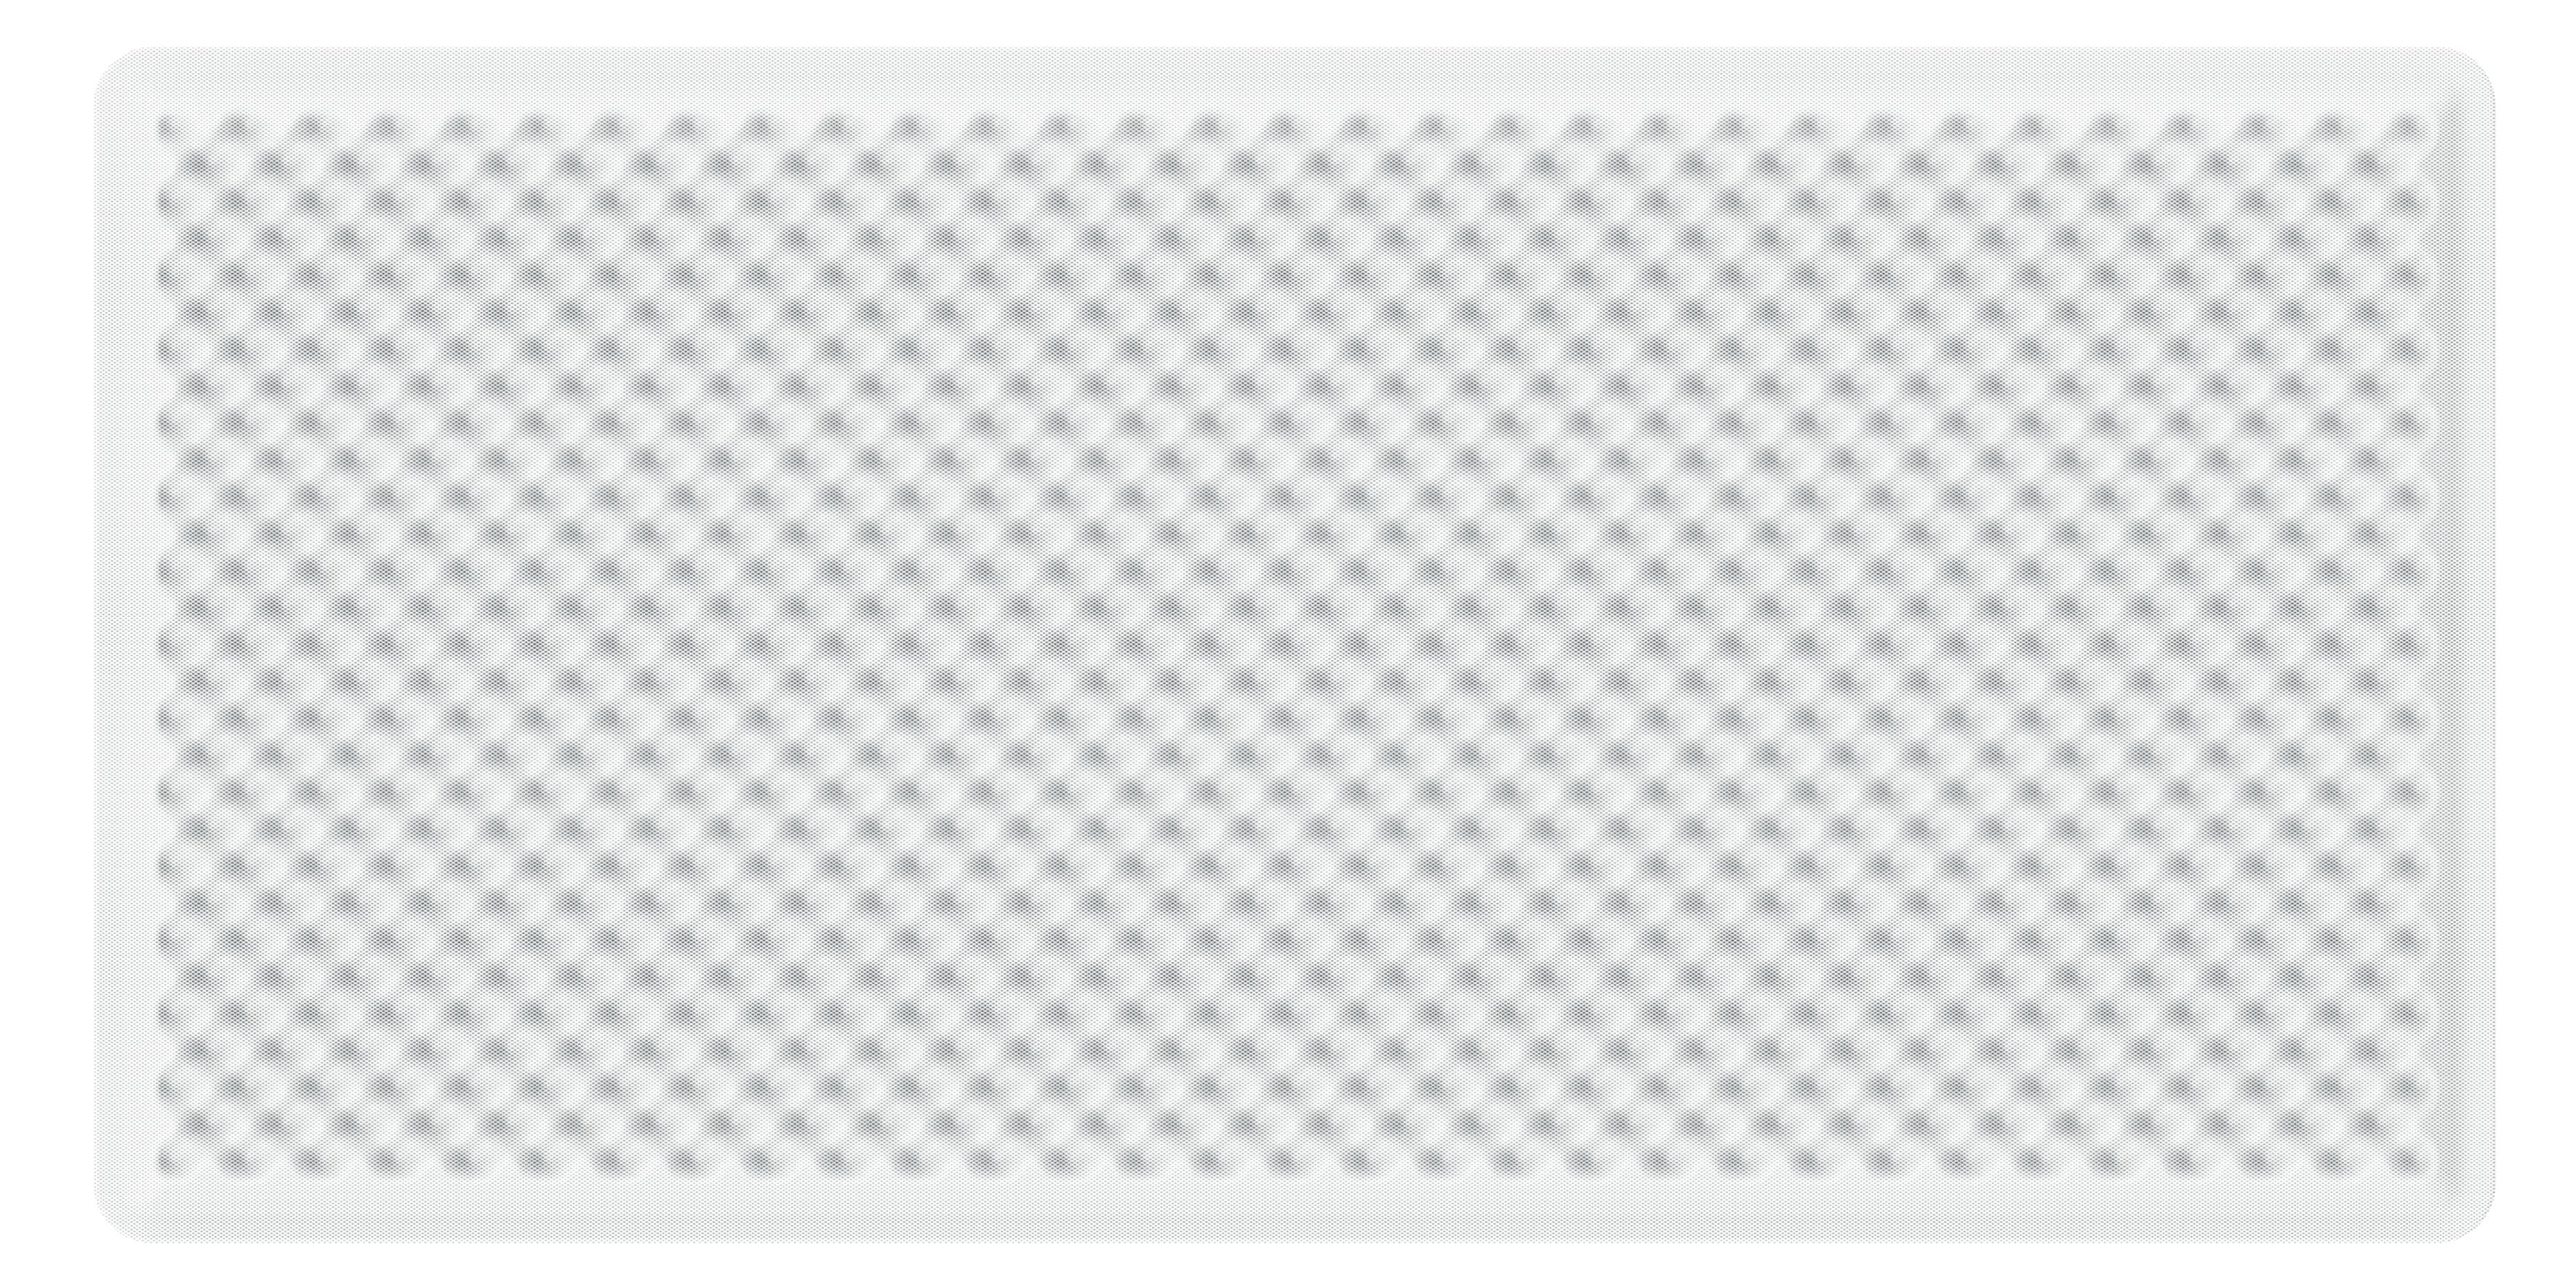 Artemide Akustikpanel Schallabsorbierend EGGBOARD WALL SUSP./CEILING ACOUSTIC PANEL 160x80 WHITE